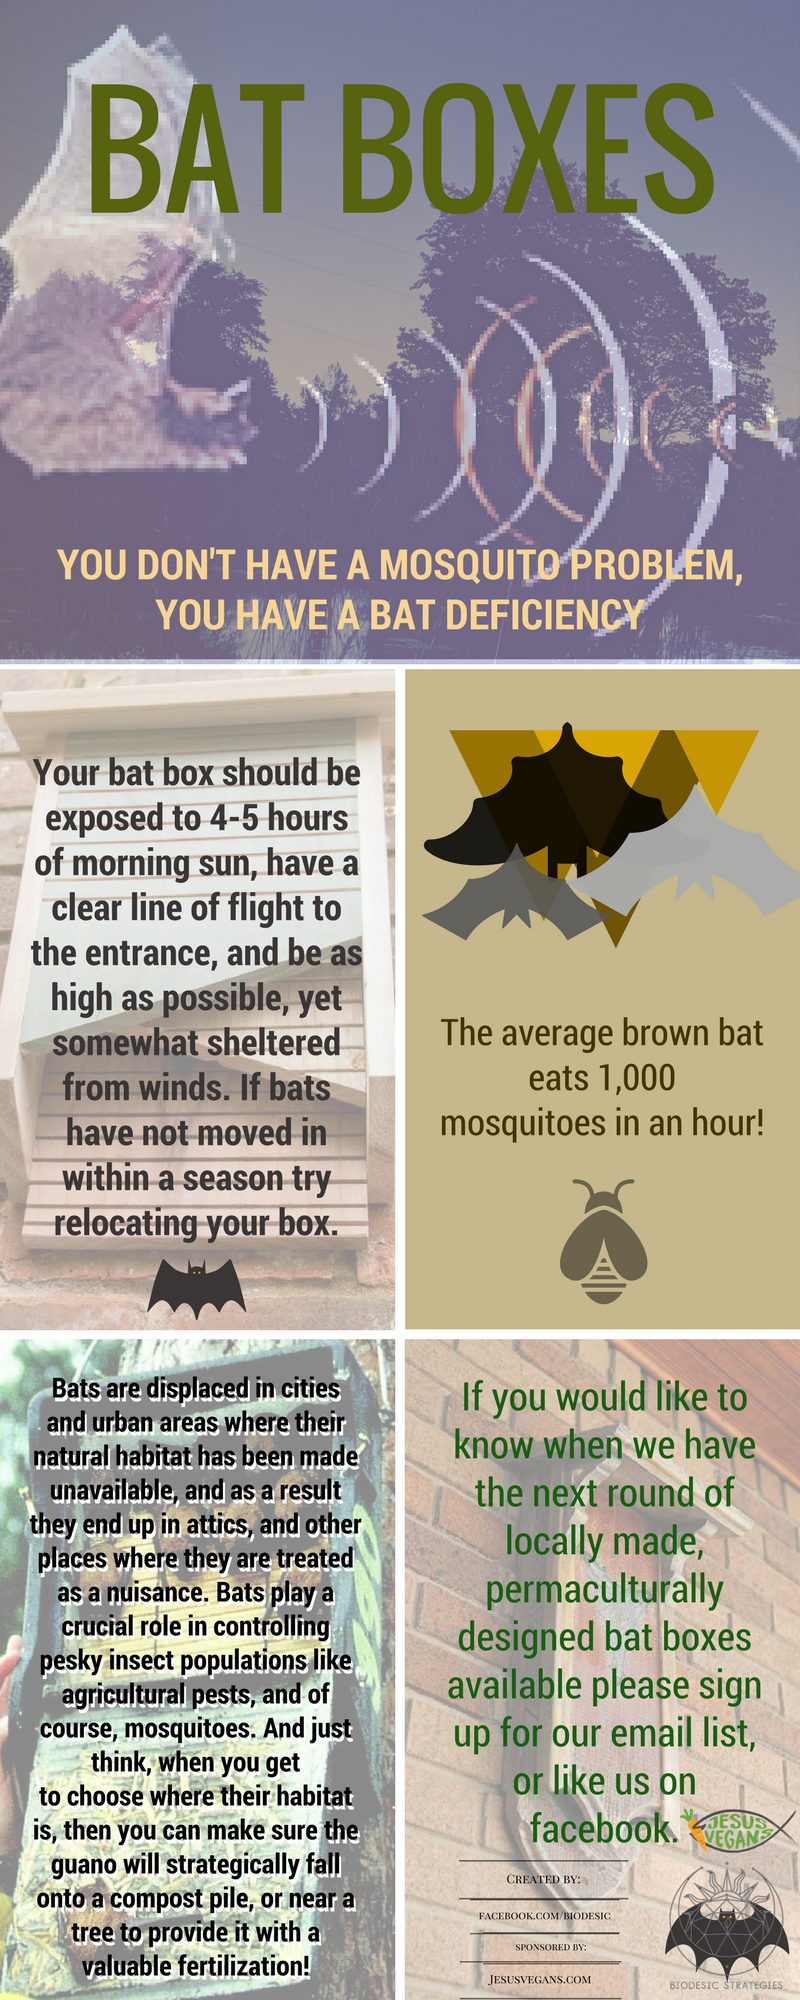 Bat_boxes.png